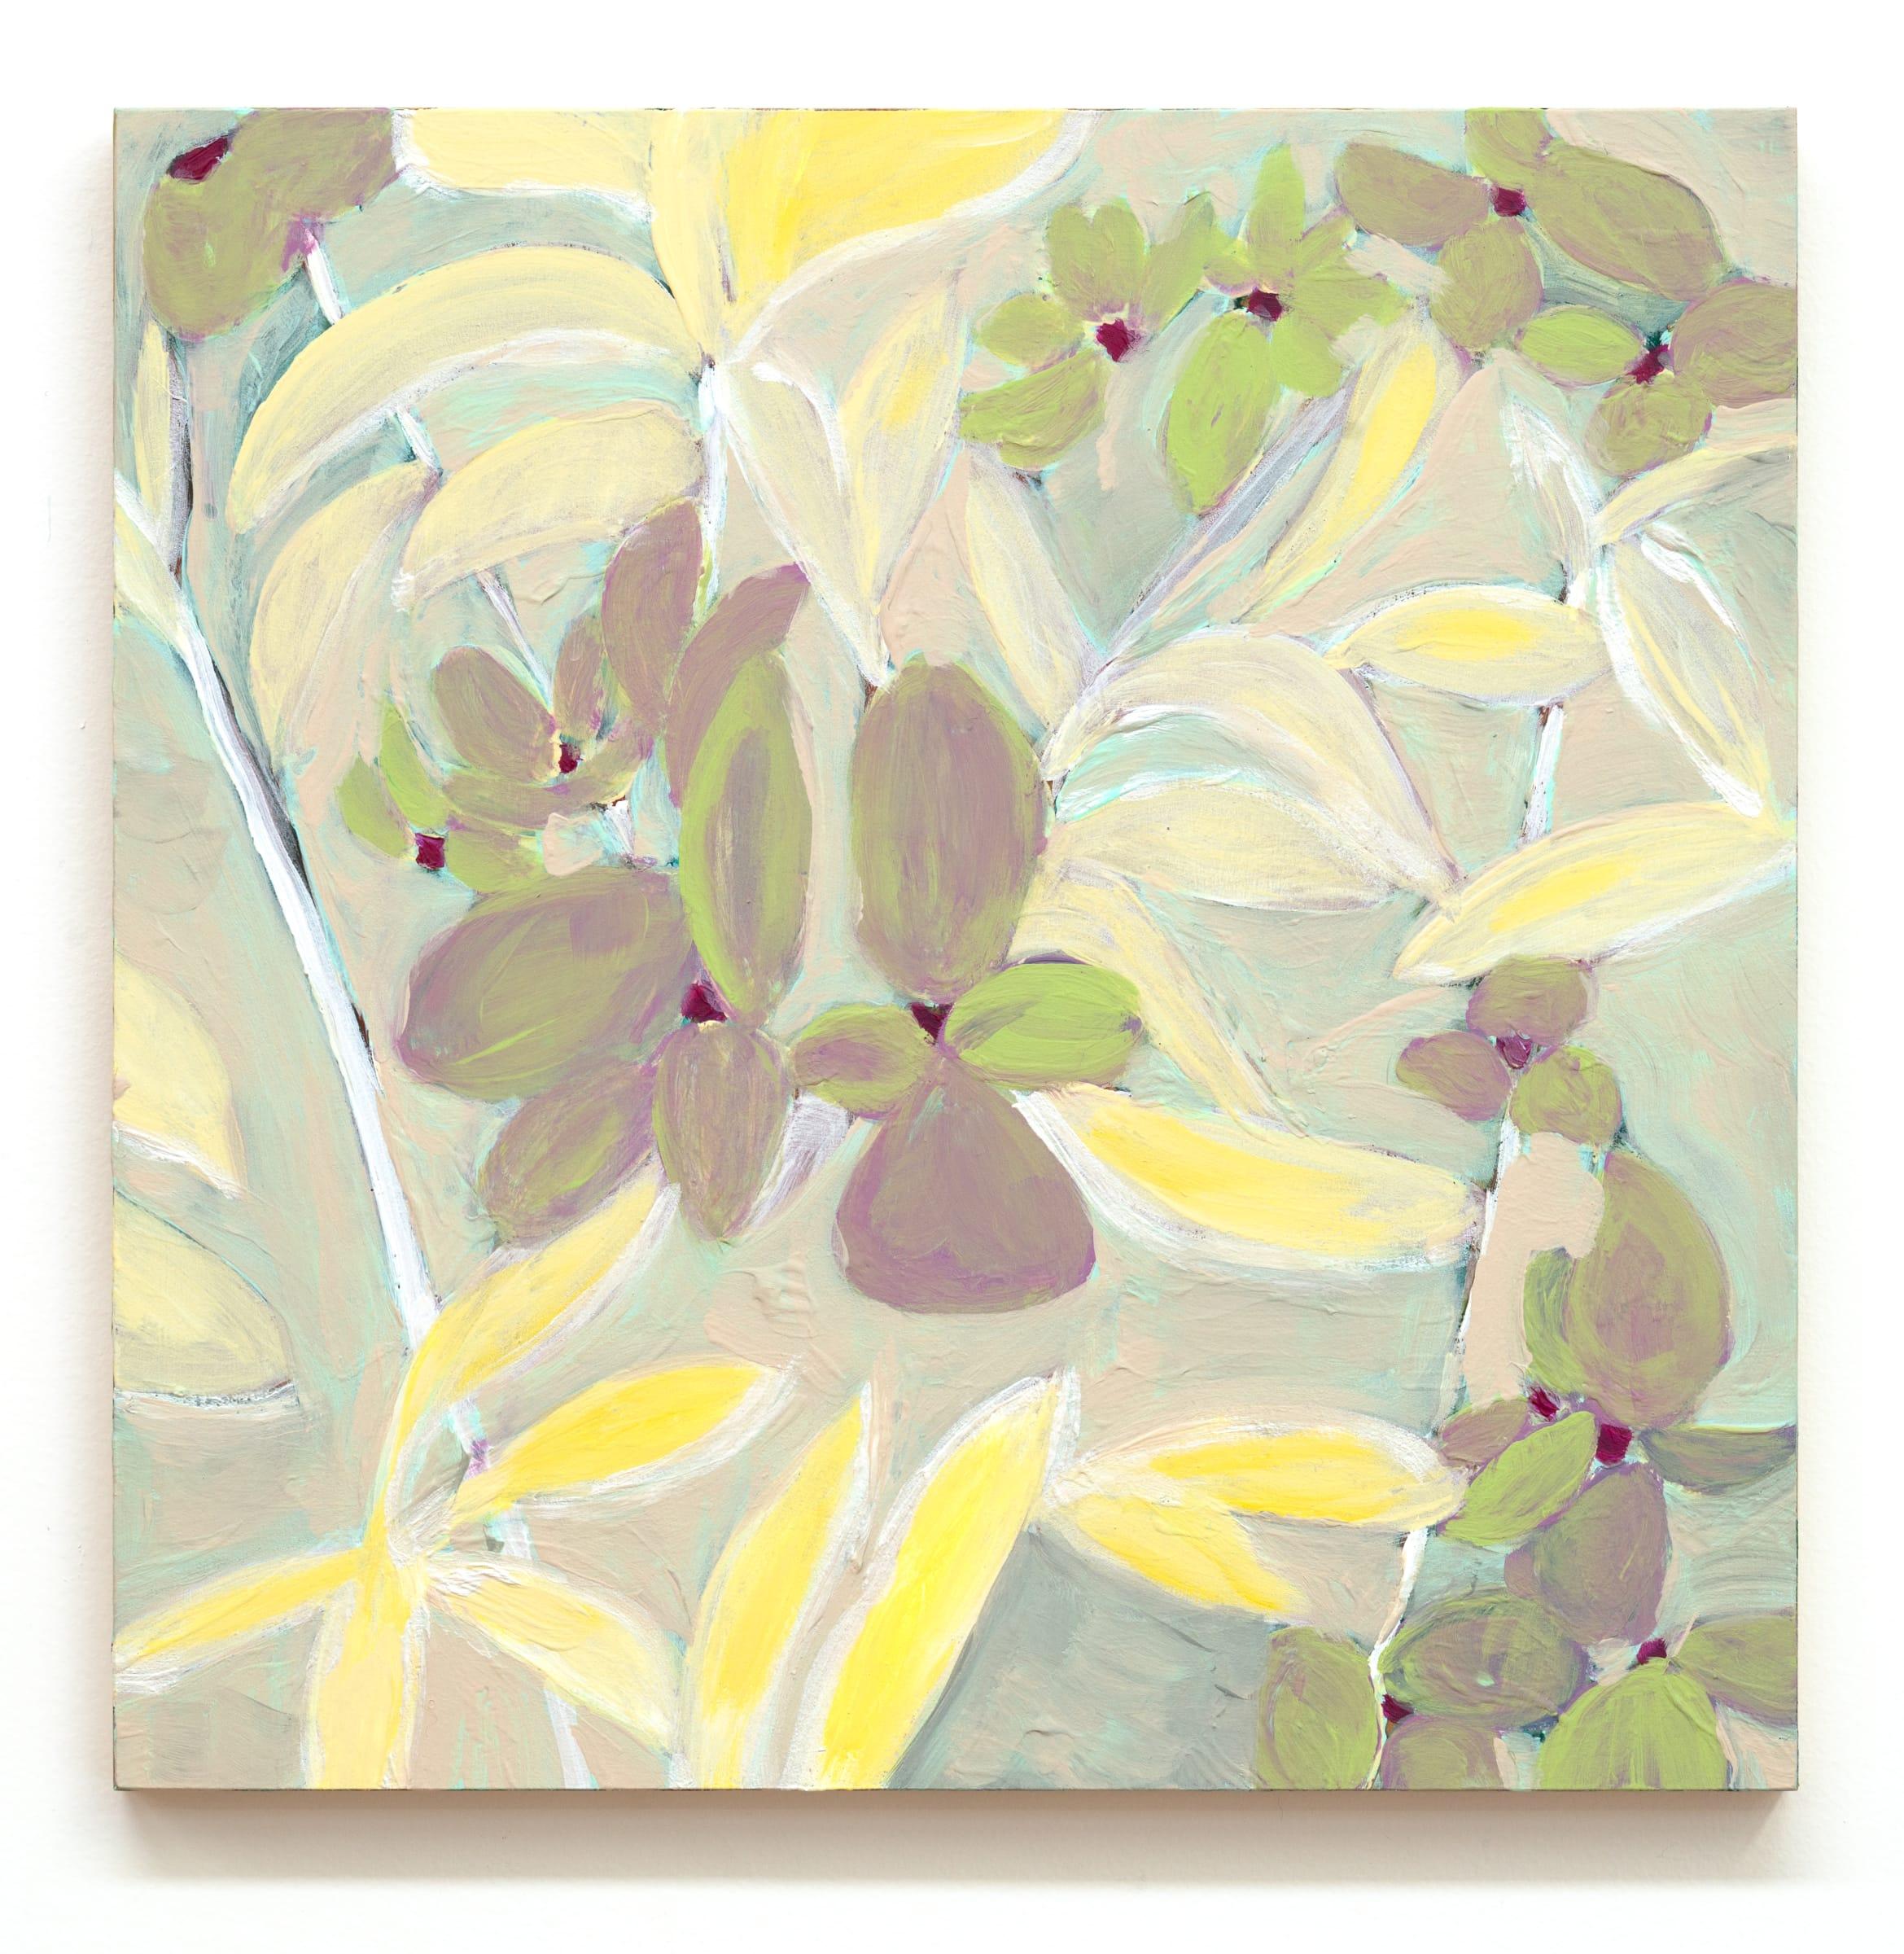 "<span class=""link fancybox-details-link""><a href=""/artists/379-negin-dastgheib/works/8559-negin-dastgheib-marshmallow-bloom-2020/"">View Detail Page</a></span>Negin Dastgheib   Marshmallow Bloom, 2020   Acrylic on board   300mm x 300mm"